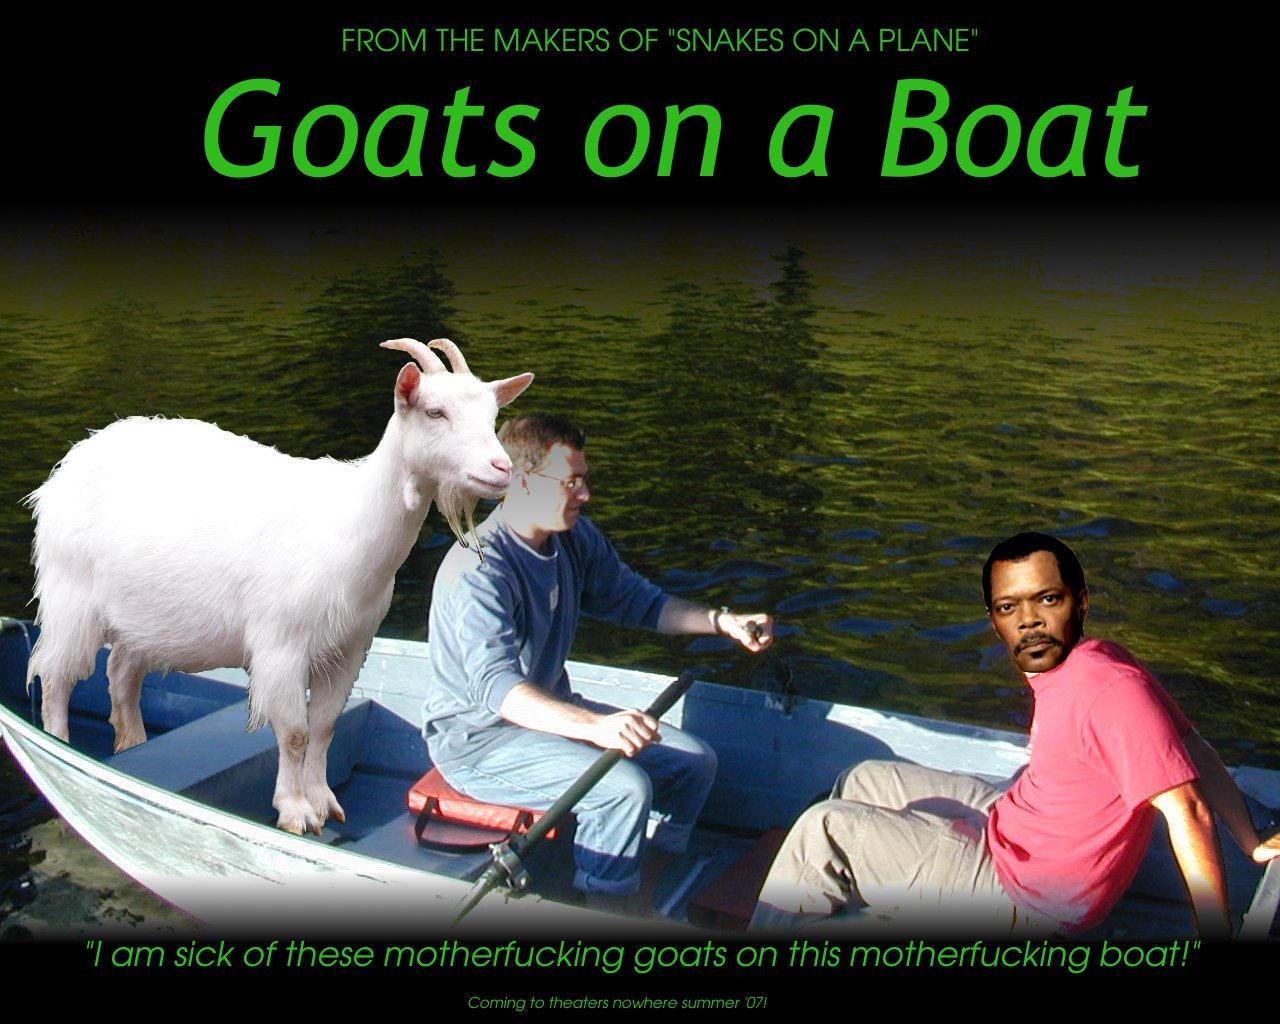 goats on a boat by valadil on deviantart